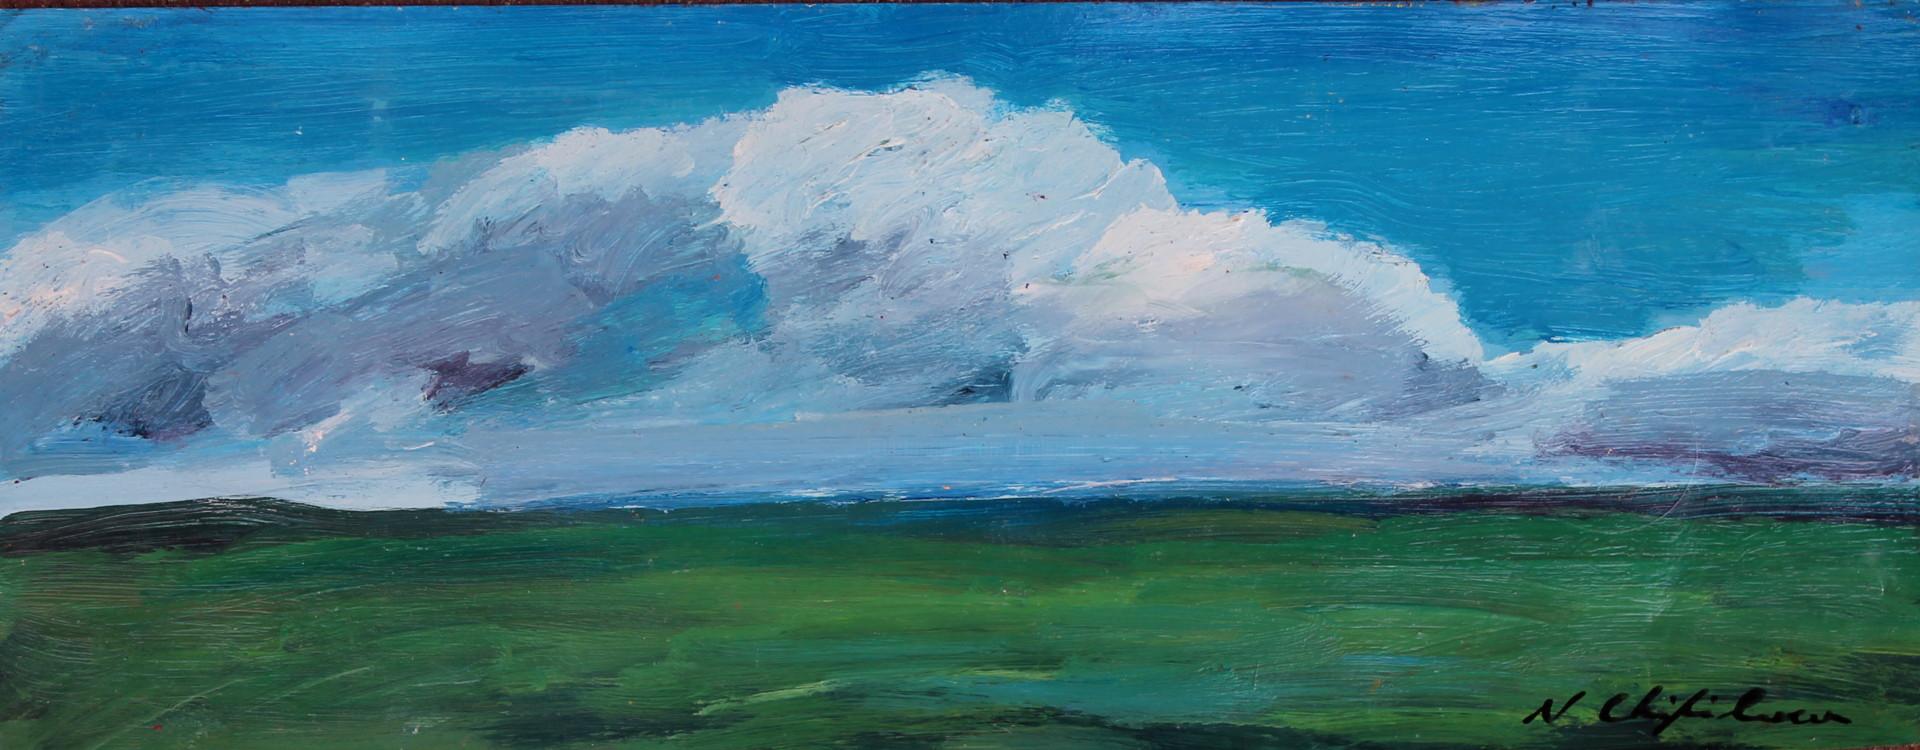 Nath Chipilova (Atelier NN art store) - Plaine étude 6 20x50